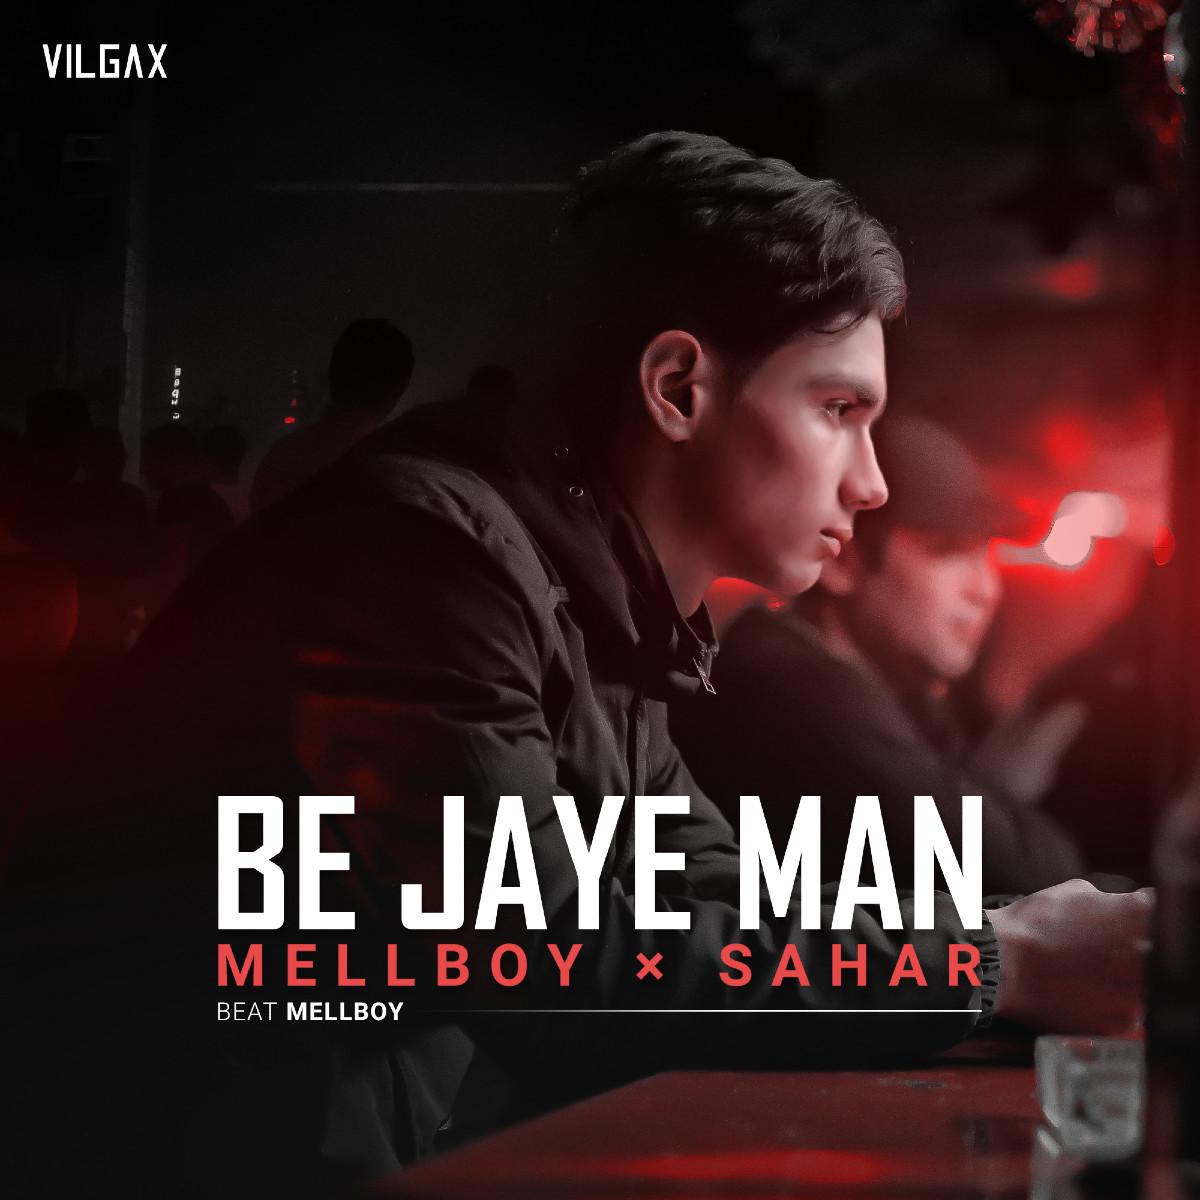 Mellboy & Sahar - Be Jaye Man